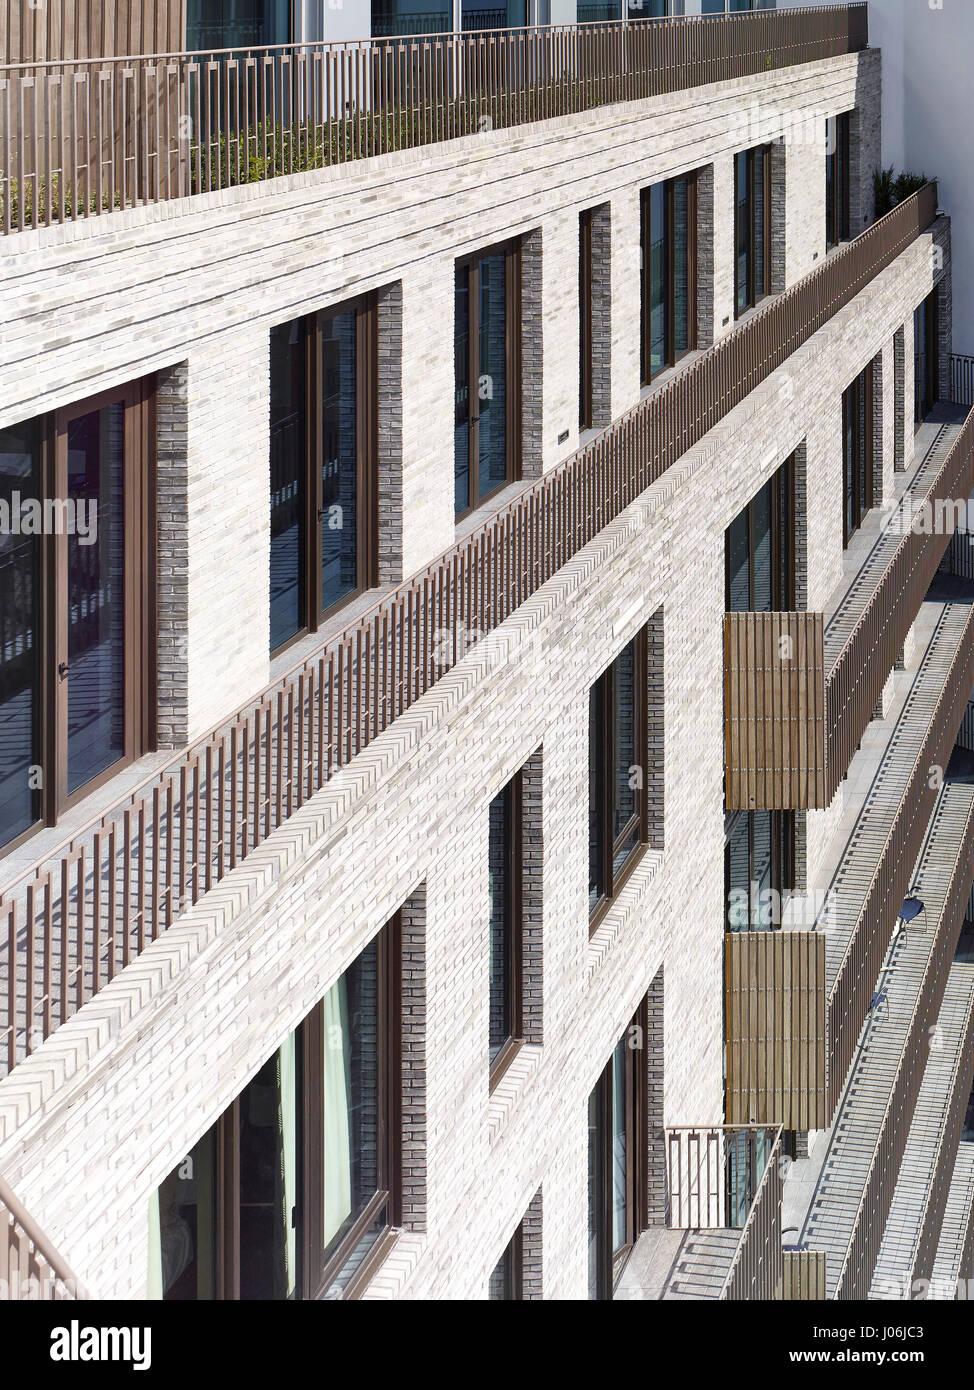 Terrace. 55 Victoria Street, London, United Kingdom. Architect: Stiff + Trevillion Architects, 2016. - Stock Image